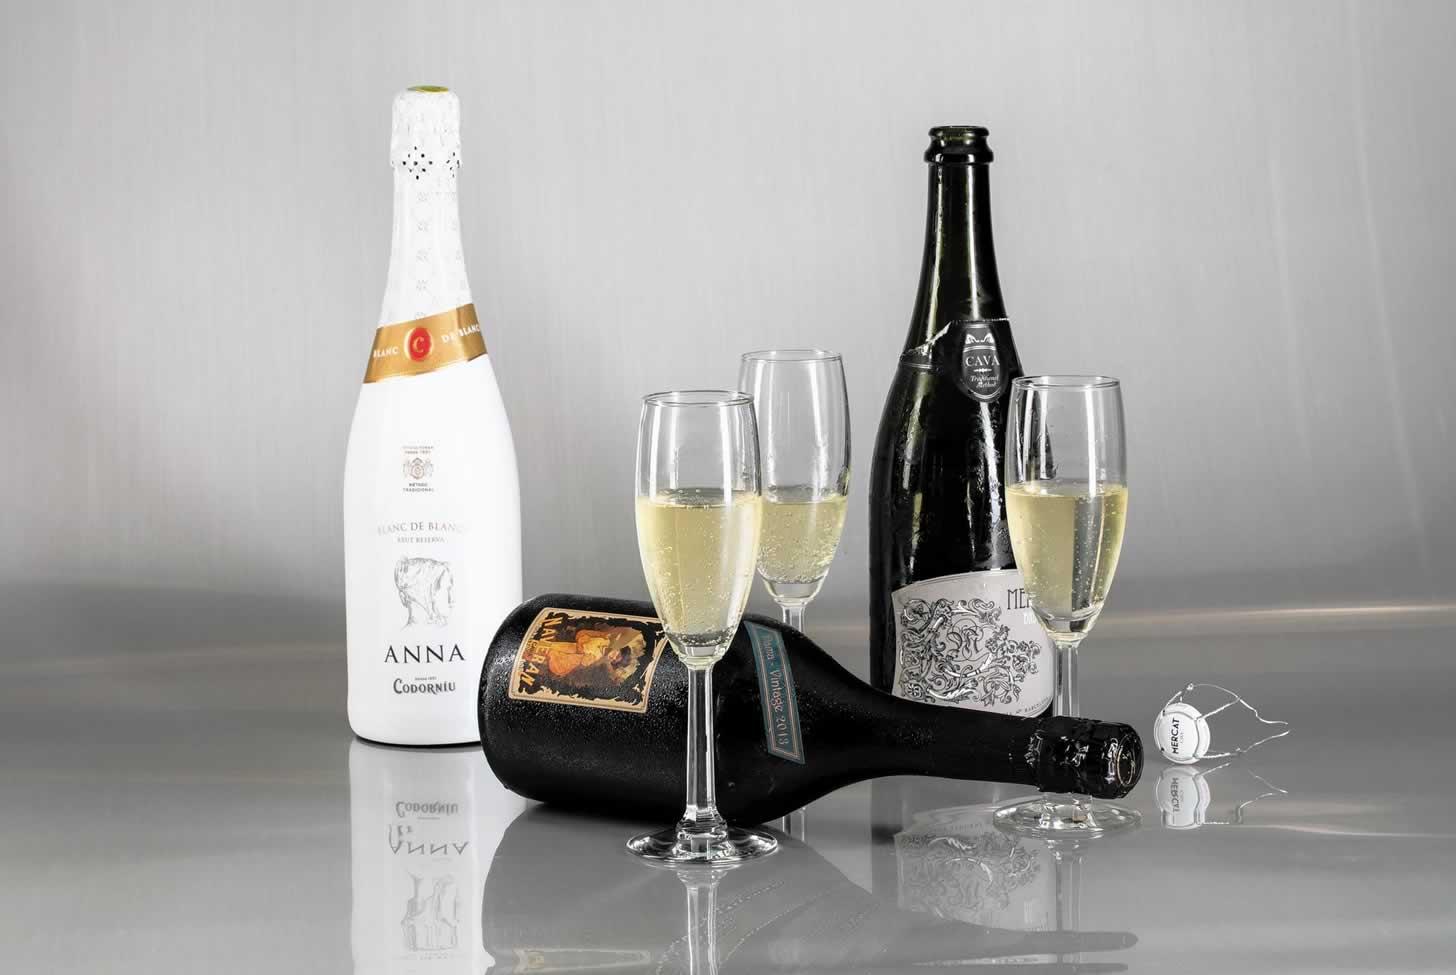 Why why wine - статьи - старый свет - испания - cava. альтернатива шампанскому?